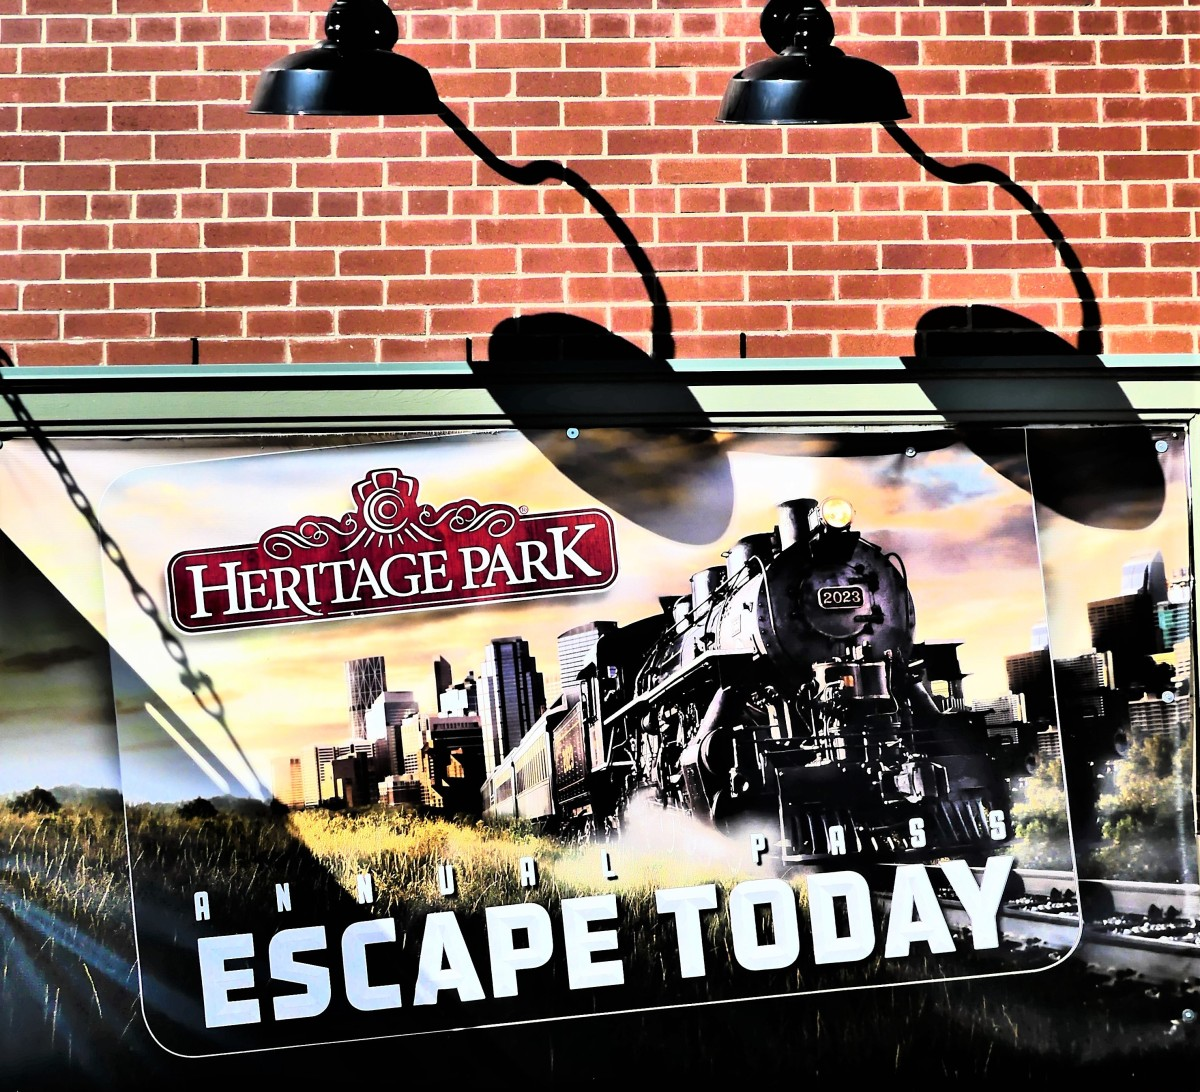 heritage park signage (2)